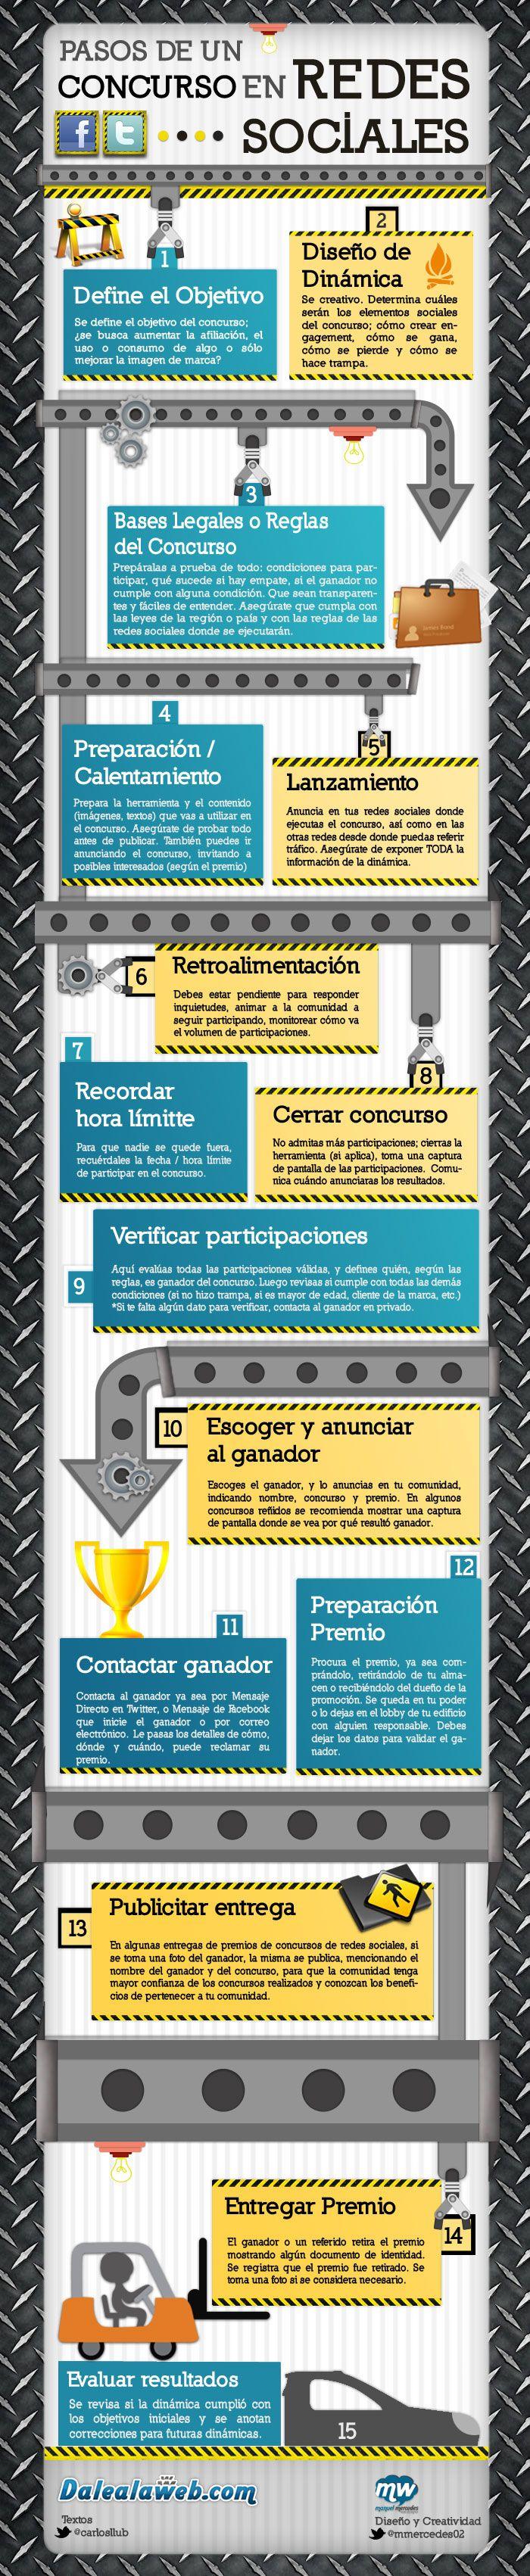 Pasos para crear un concurso en redes sociales [Infografía]